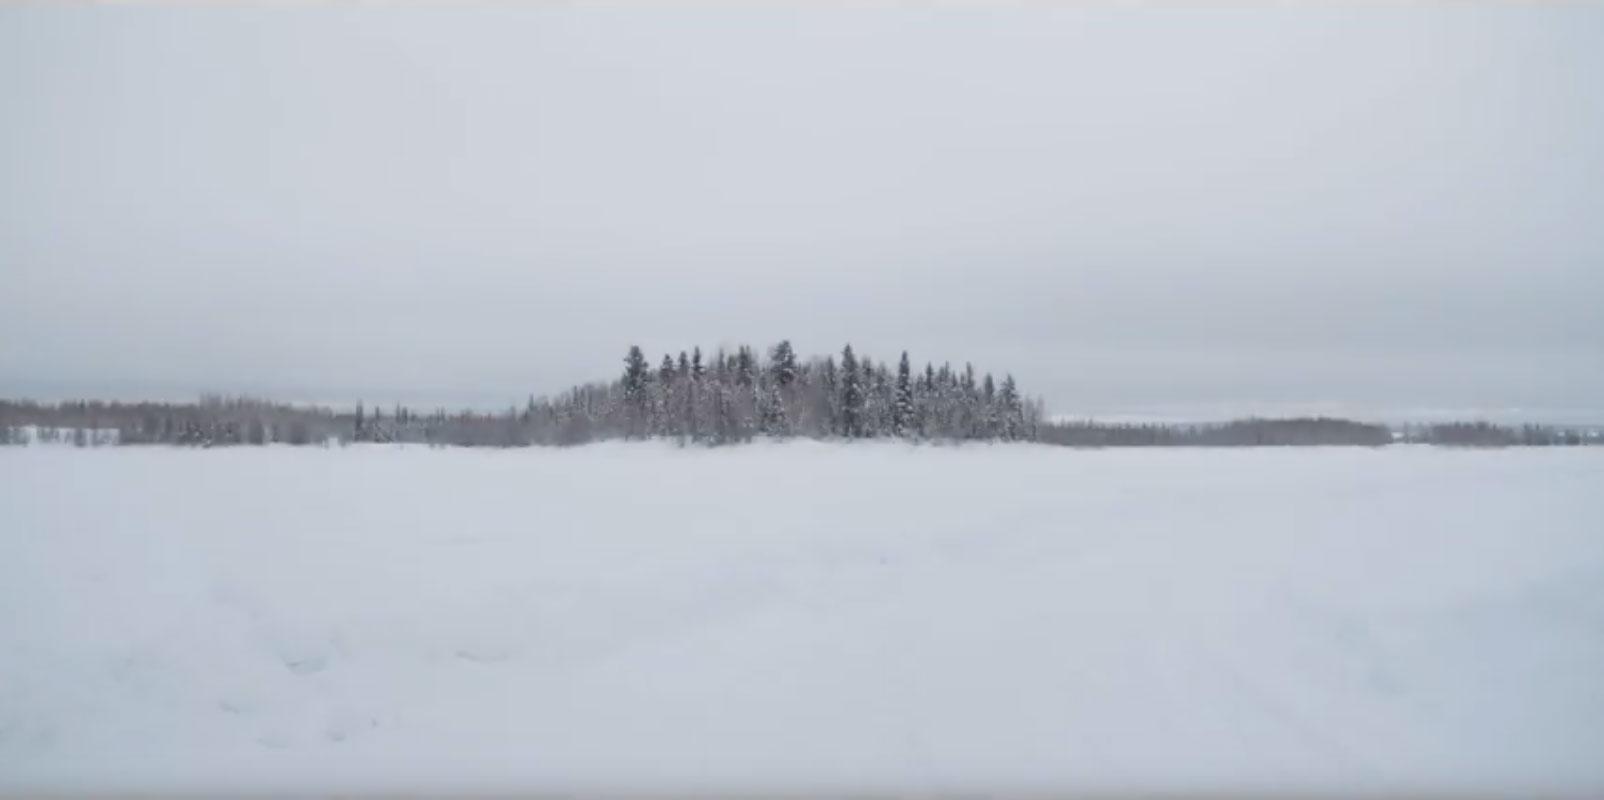 Guided Ice Fishing in Alaska | Ice Fishing in Fairbanks